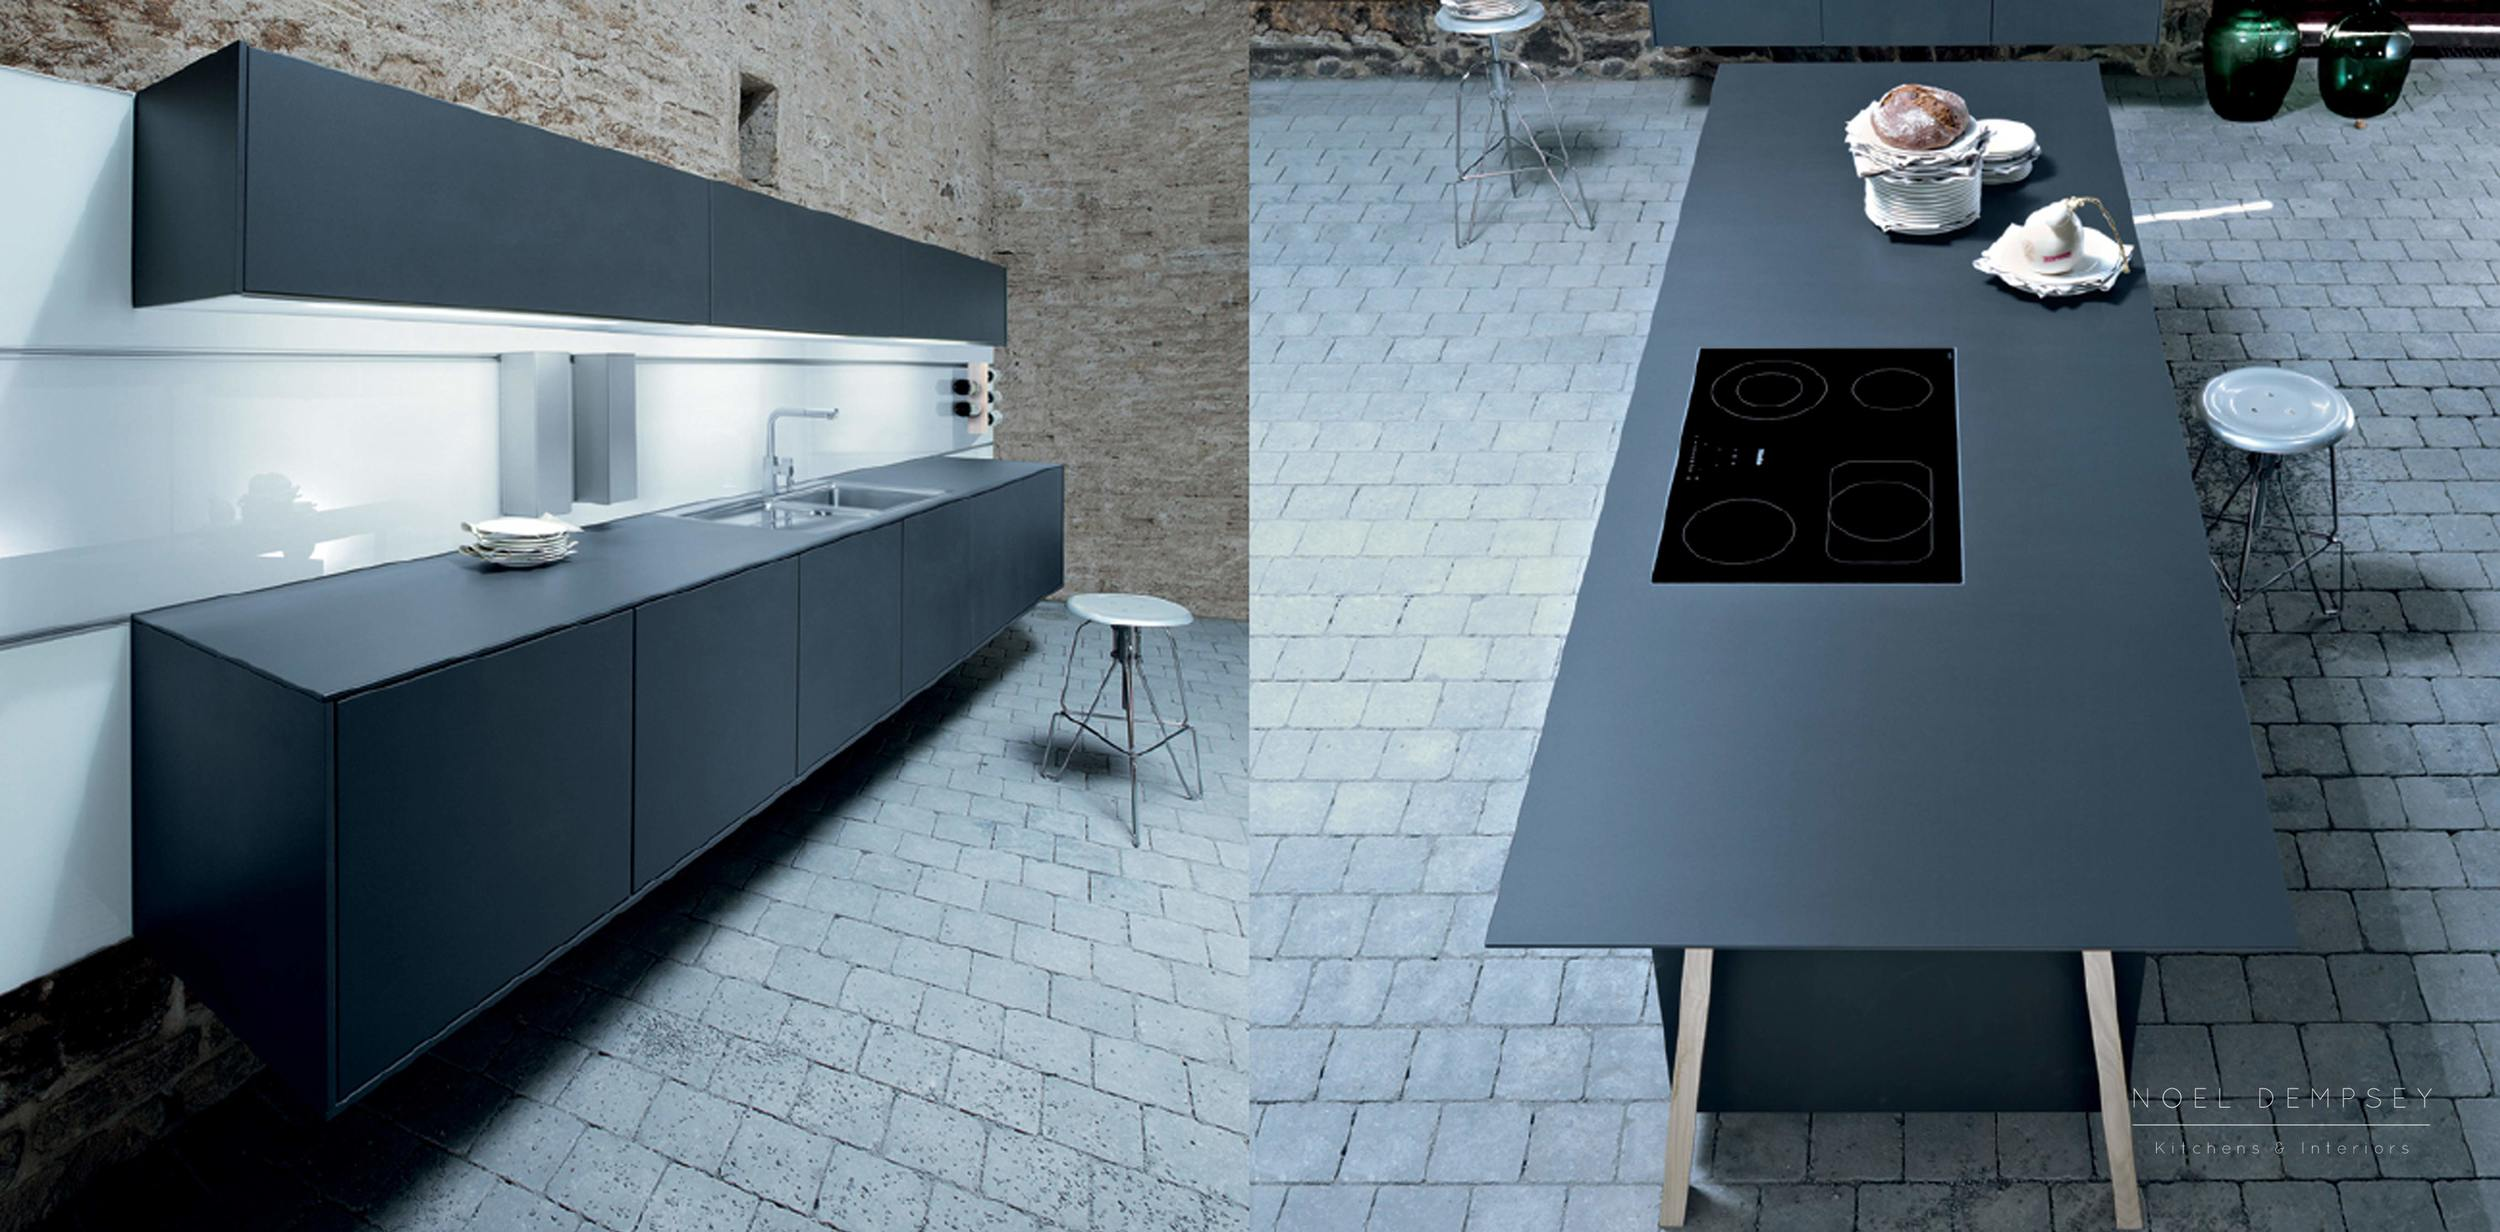 NX500-Satin-Lava-Black-German-Kitchen-2.jpg